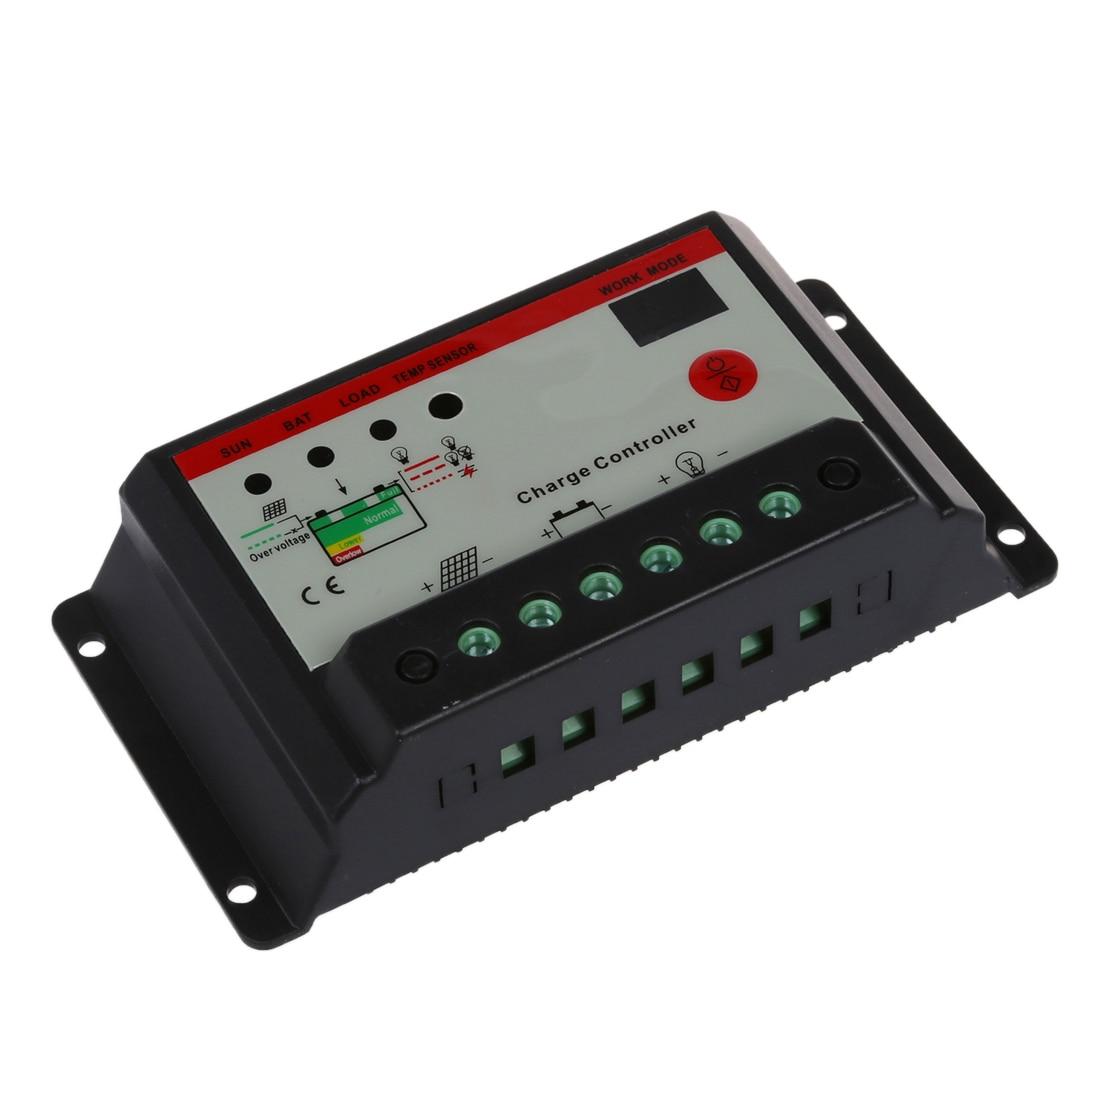 Regulator charging solar panel solar panel controller 3012 / 24VRegulator charging solar panel solar panel controller 3012 / 24V